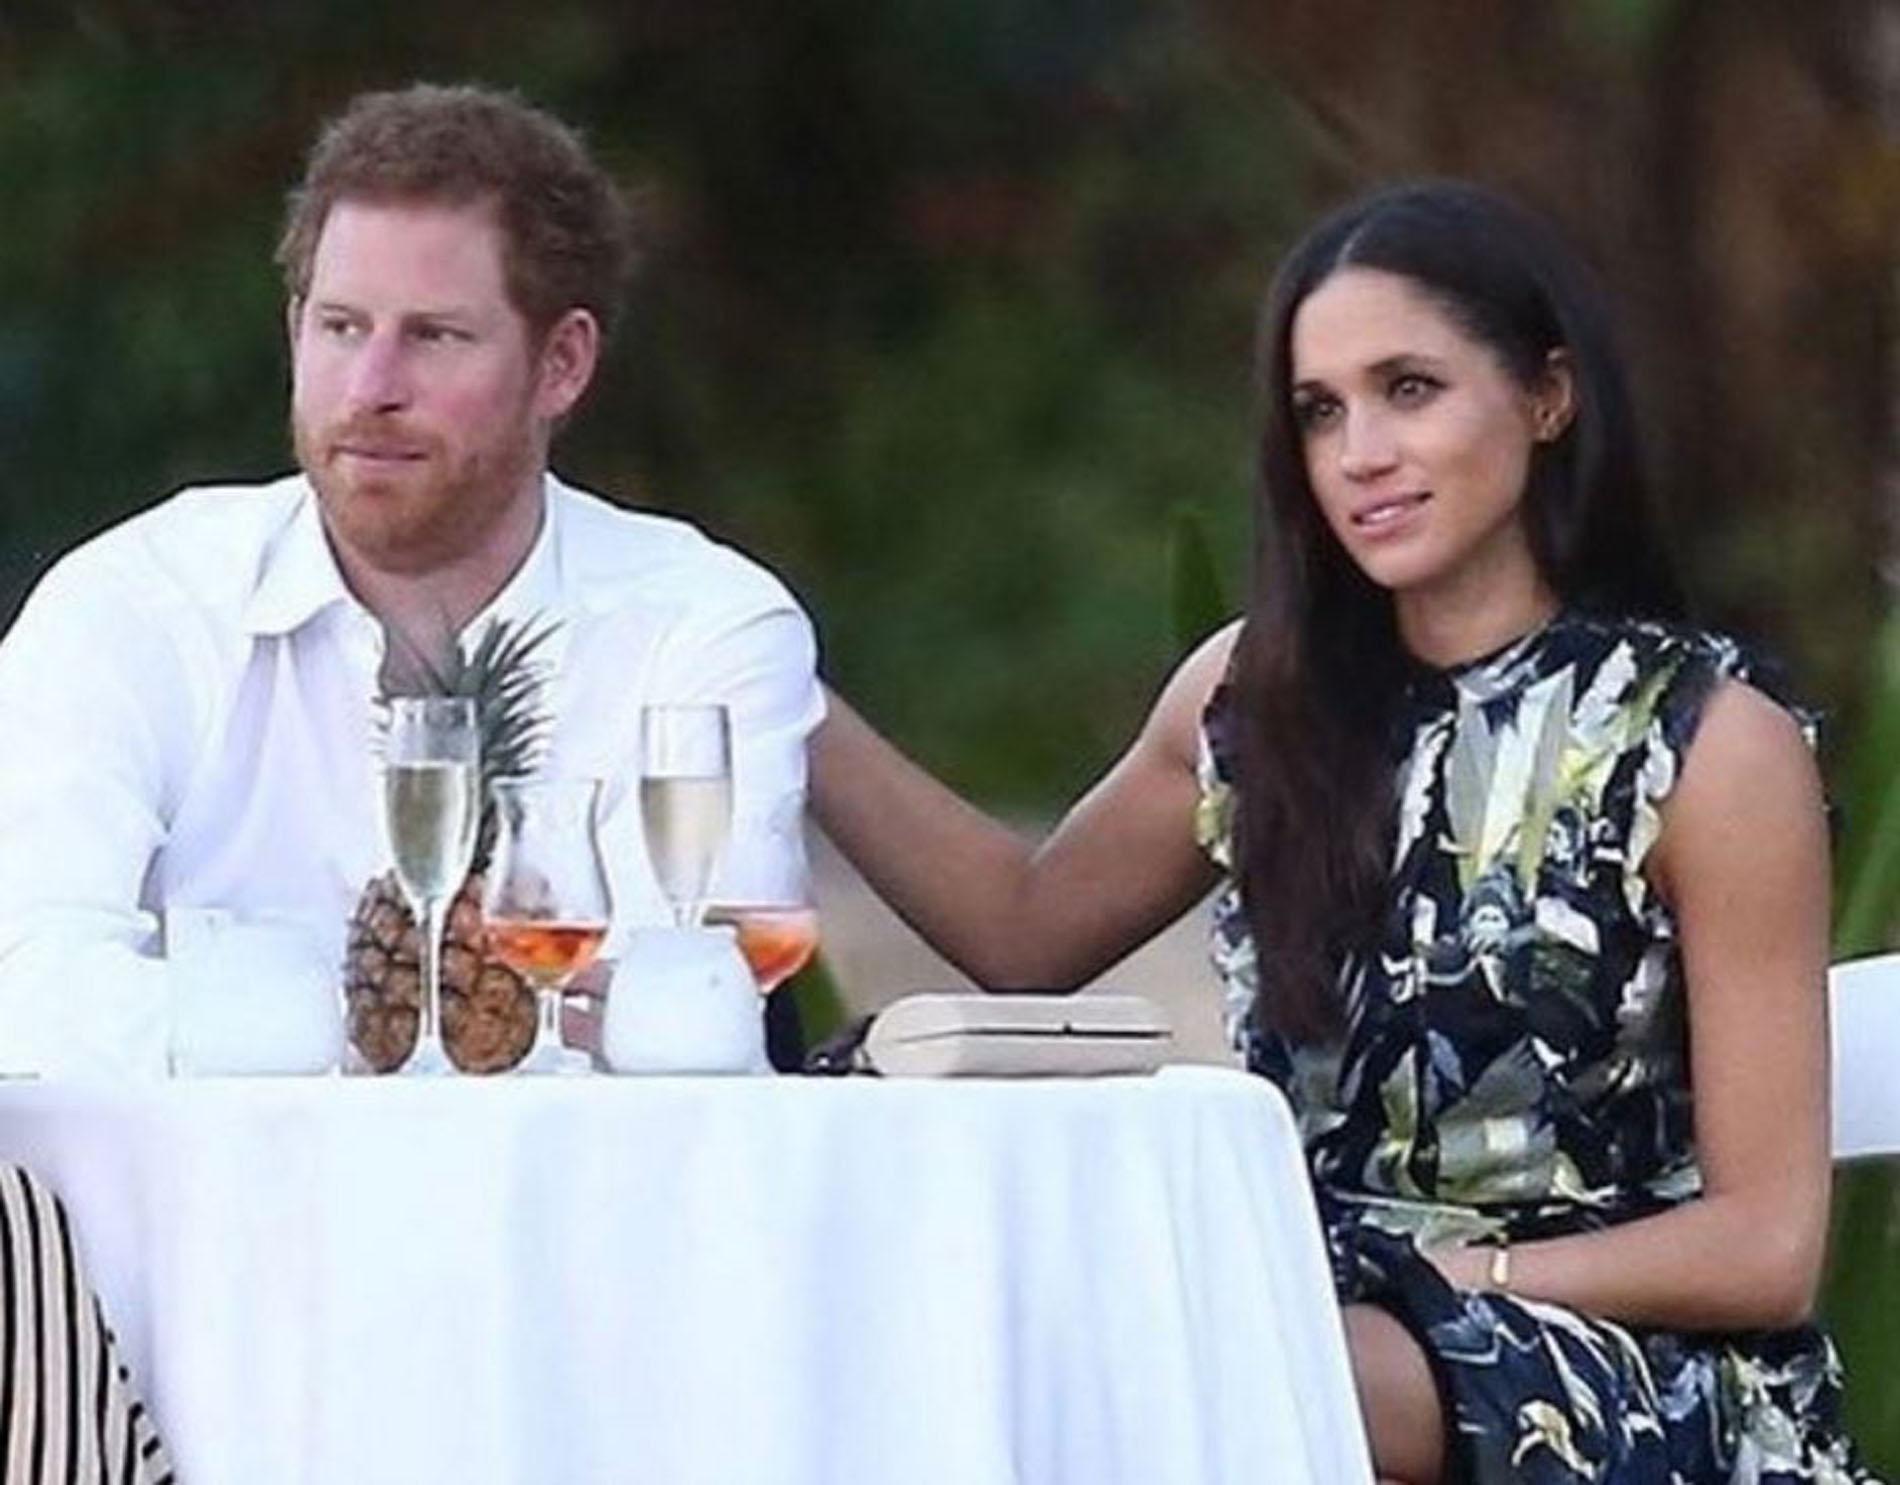 Le prince Harry avec sa petite amie Meghan Markle